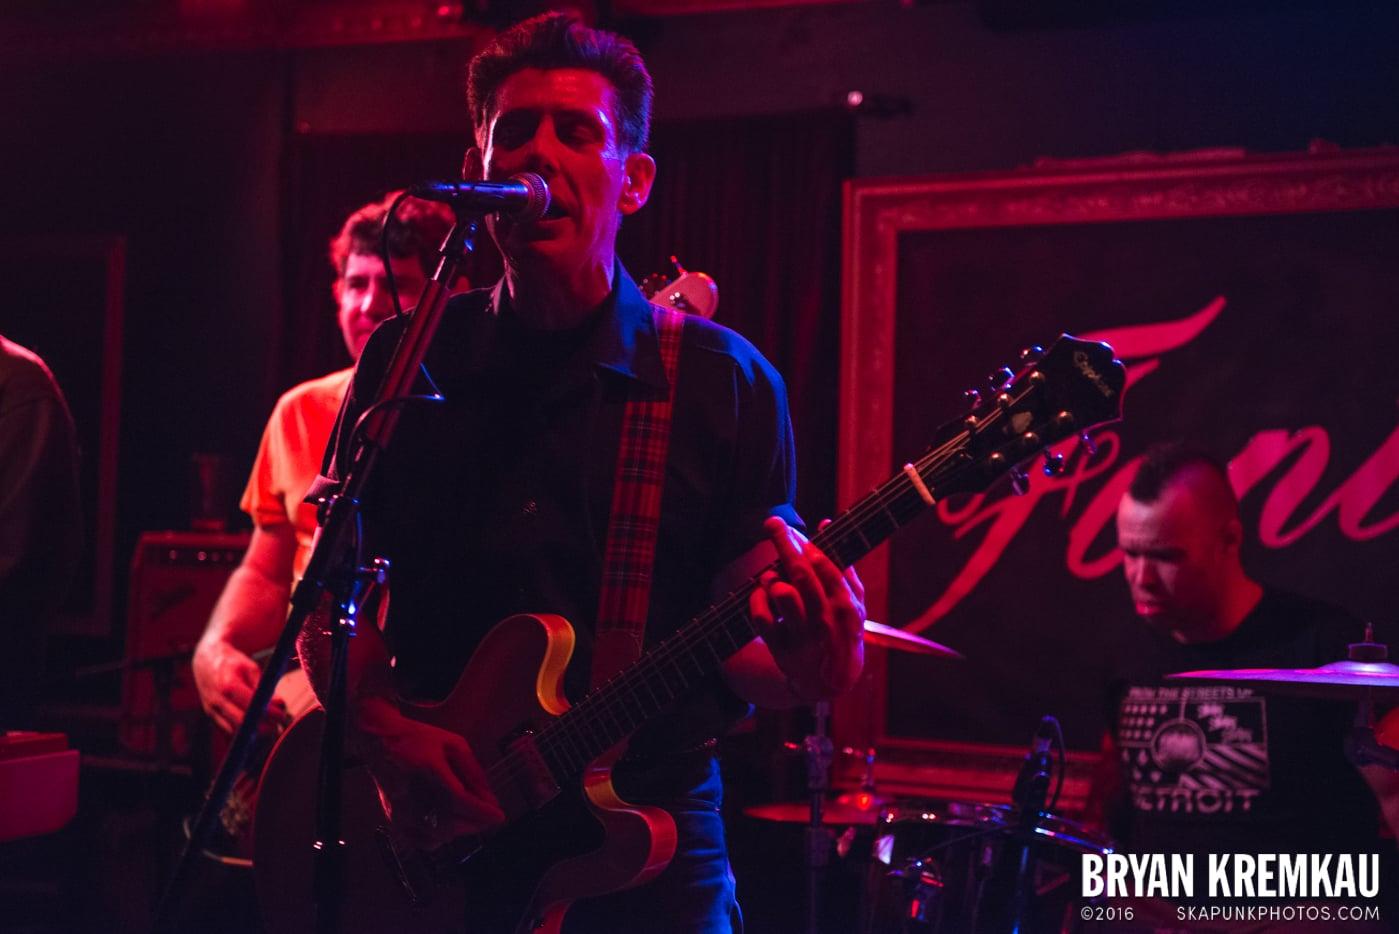 Roddy Radiation & The Scotch Bonnets @ Fontana's, NYC - 4.25.15 (12)